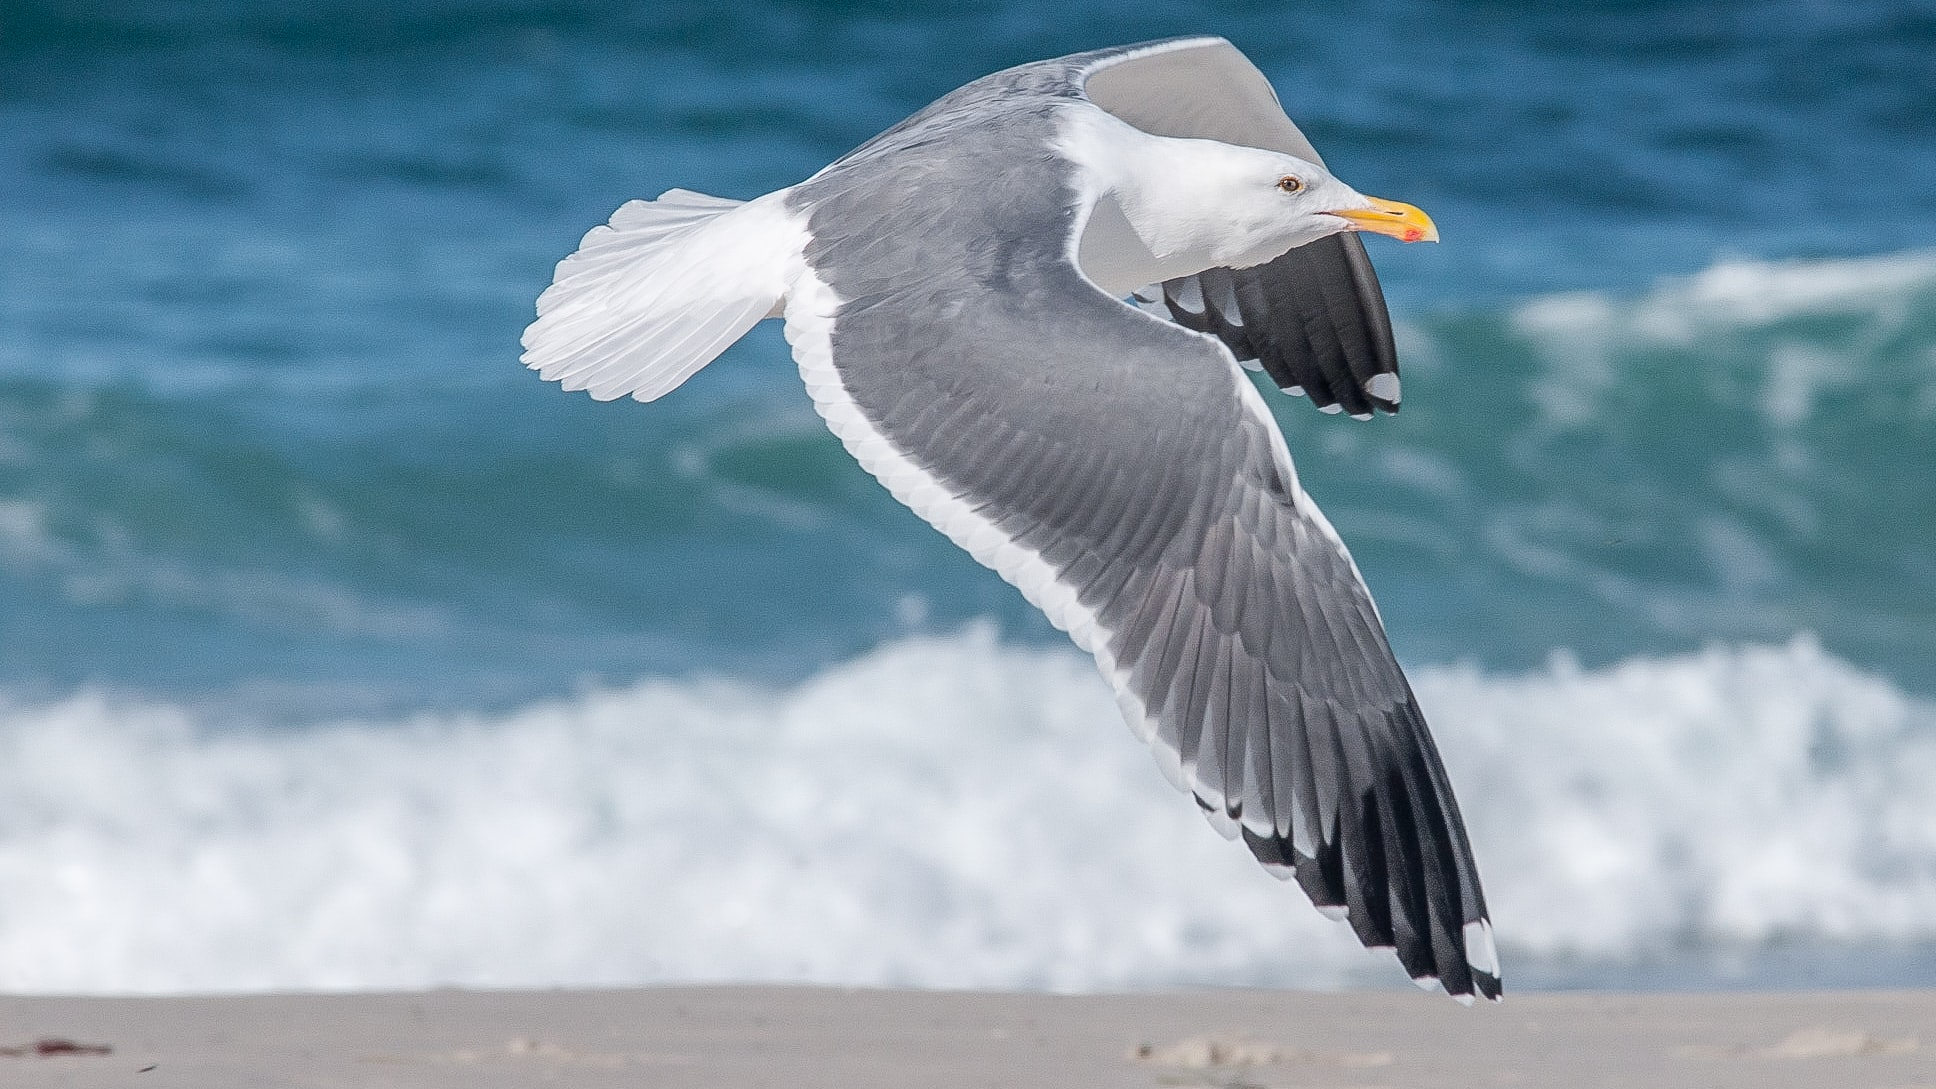 white and gray seagull flying near seashore